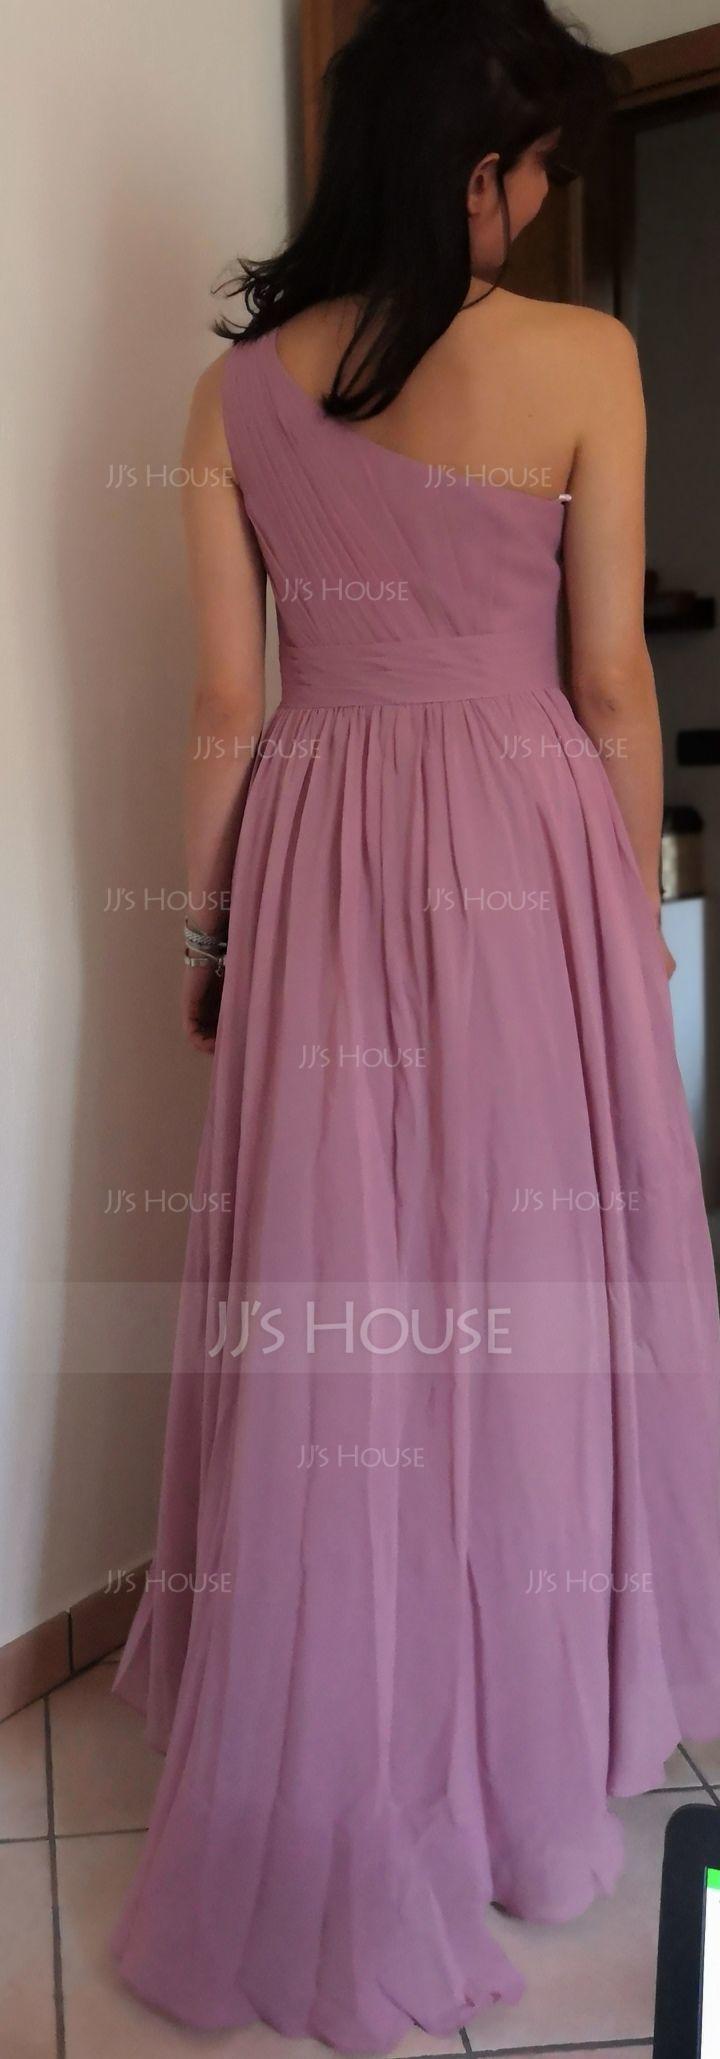 One-Shoulder Asymmetrical Chiffon Bridesmaid Dress With Cascading Ruffles (266195973)